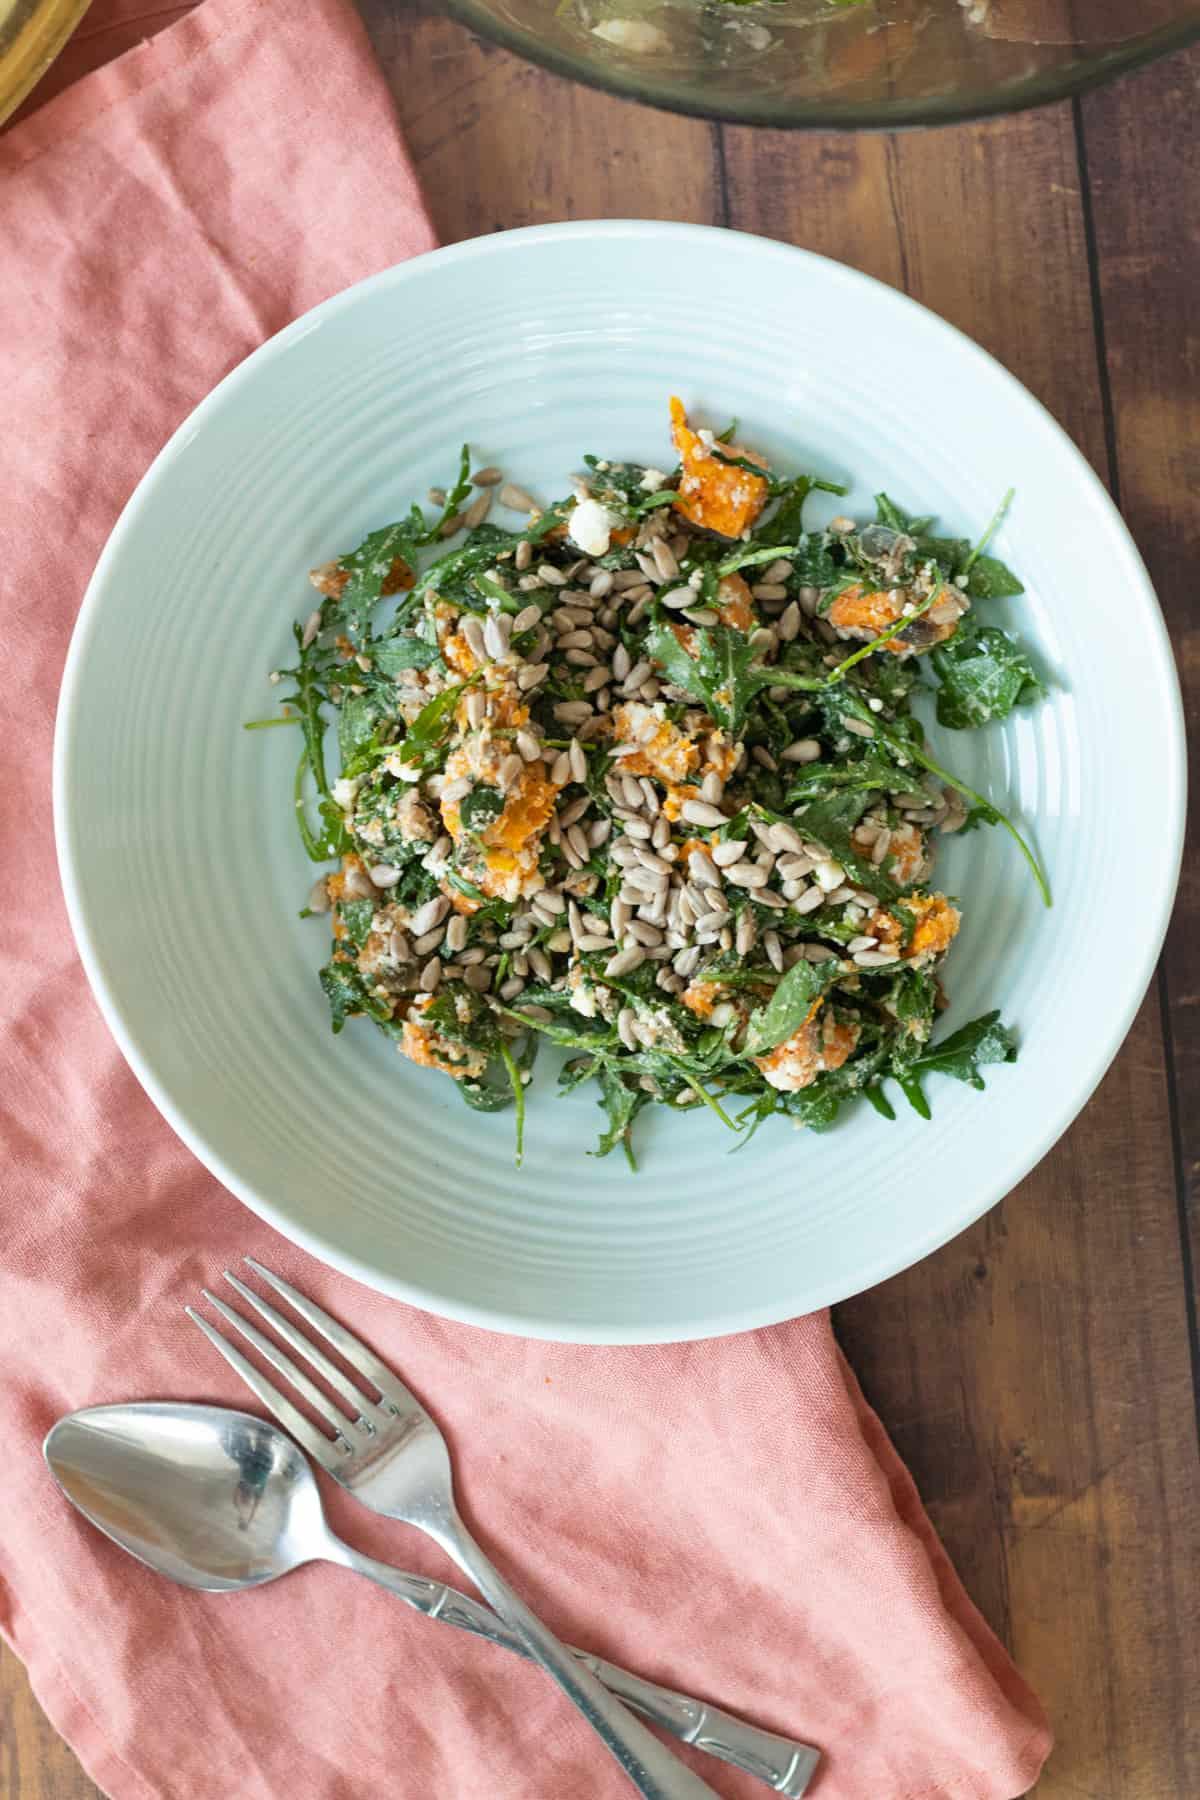 sweet potato feta salad in a blue bowl